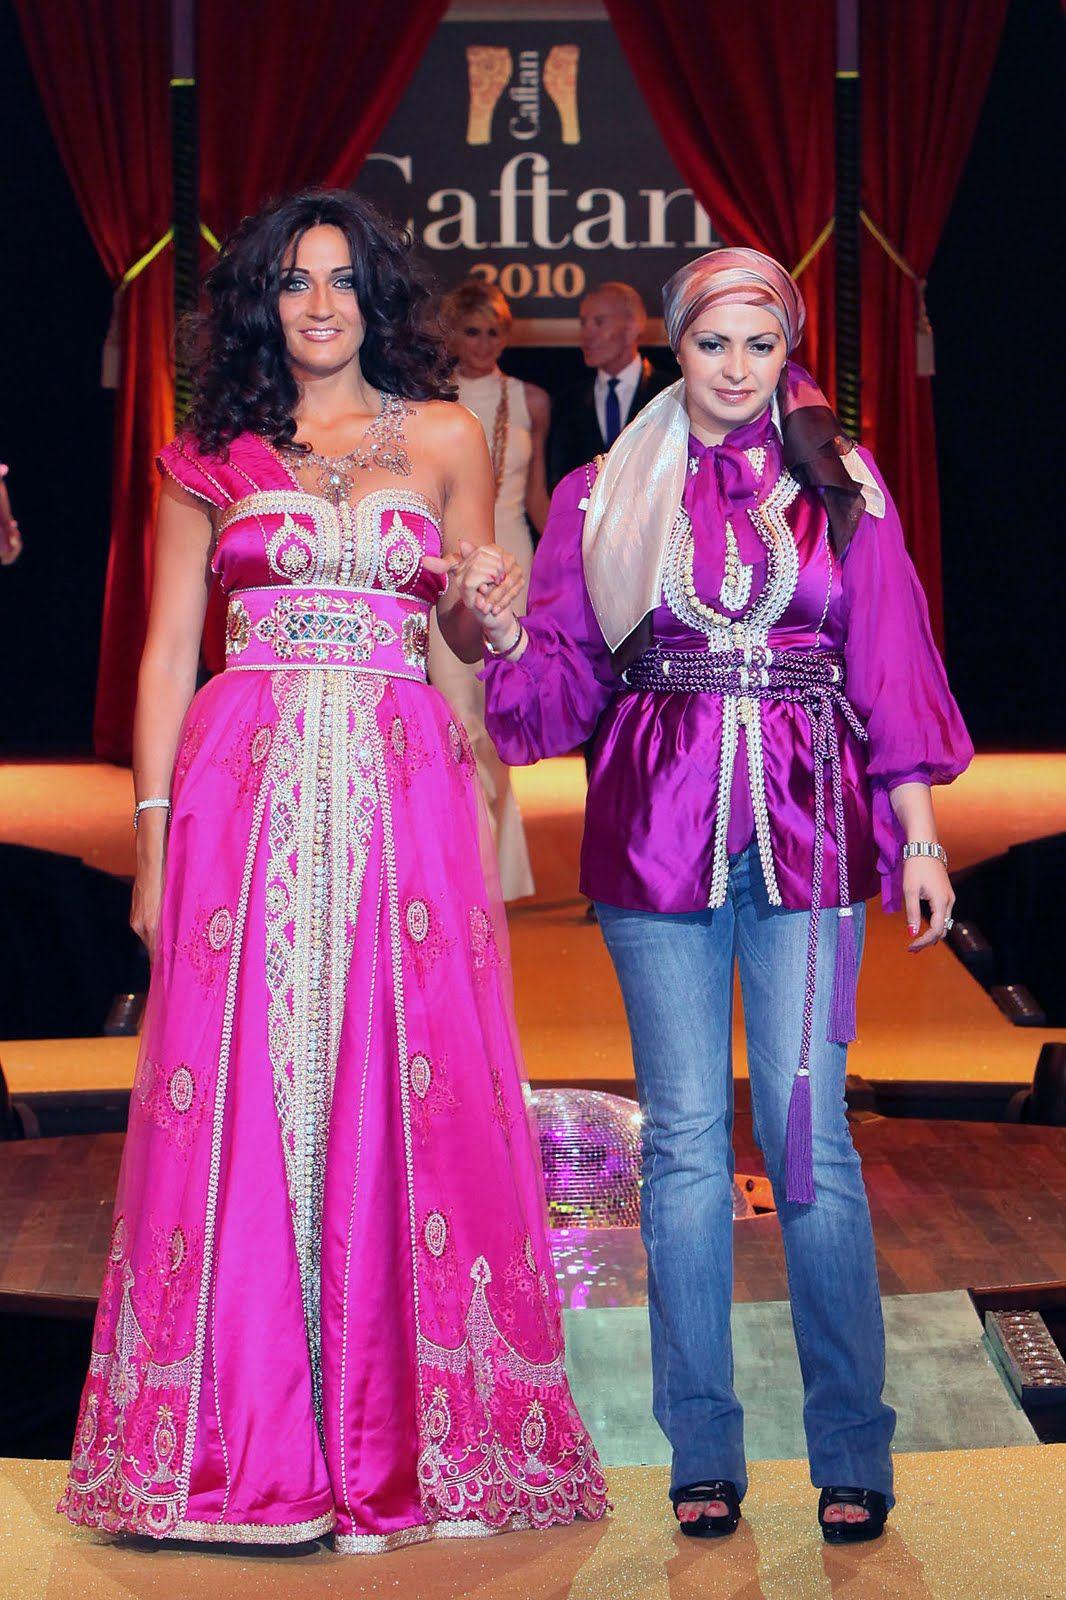 Caftan Marocain Haute Couture Robe Pinterest Caftans Jolie Clothing Aftan Dress